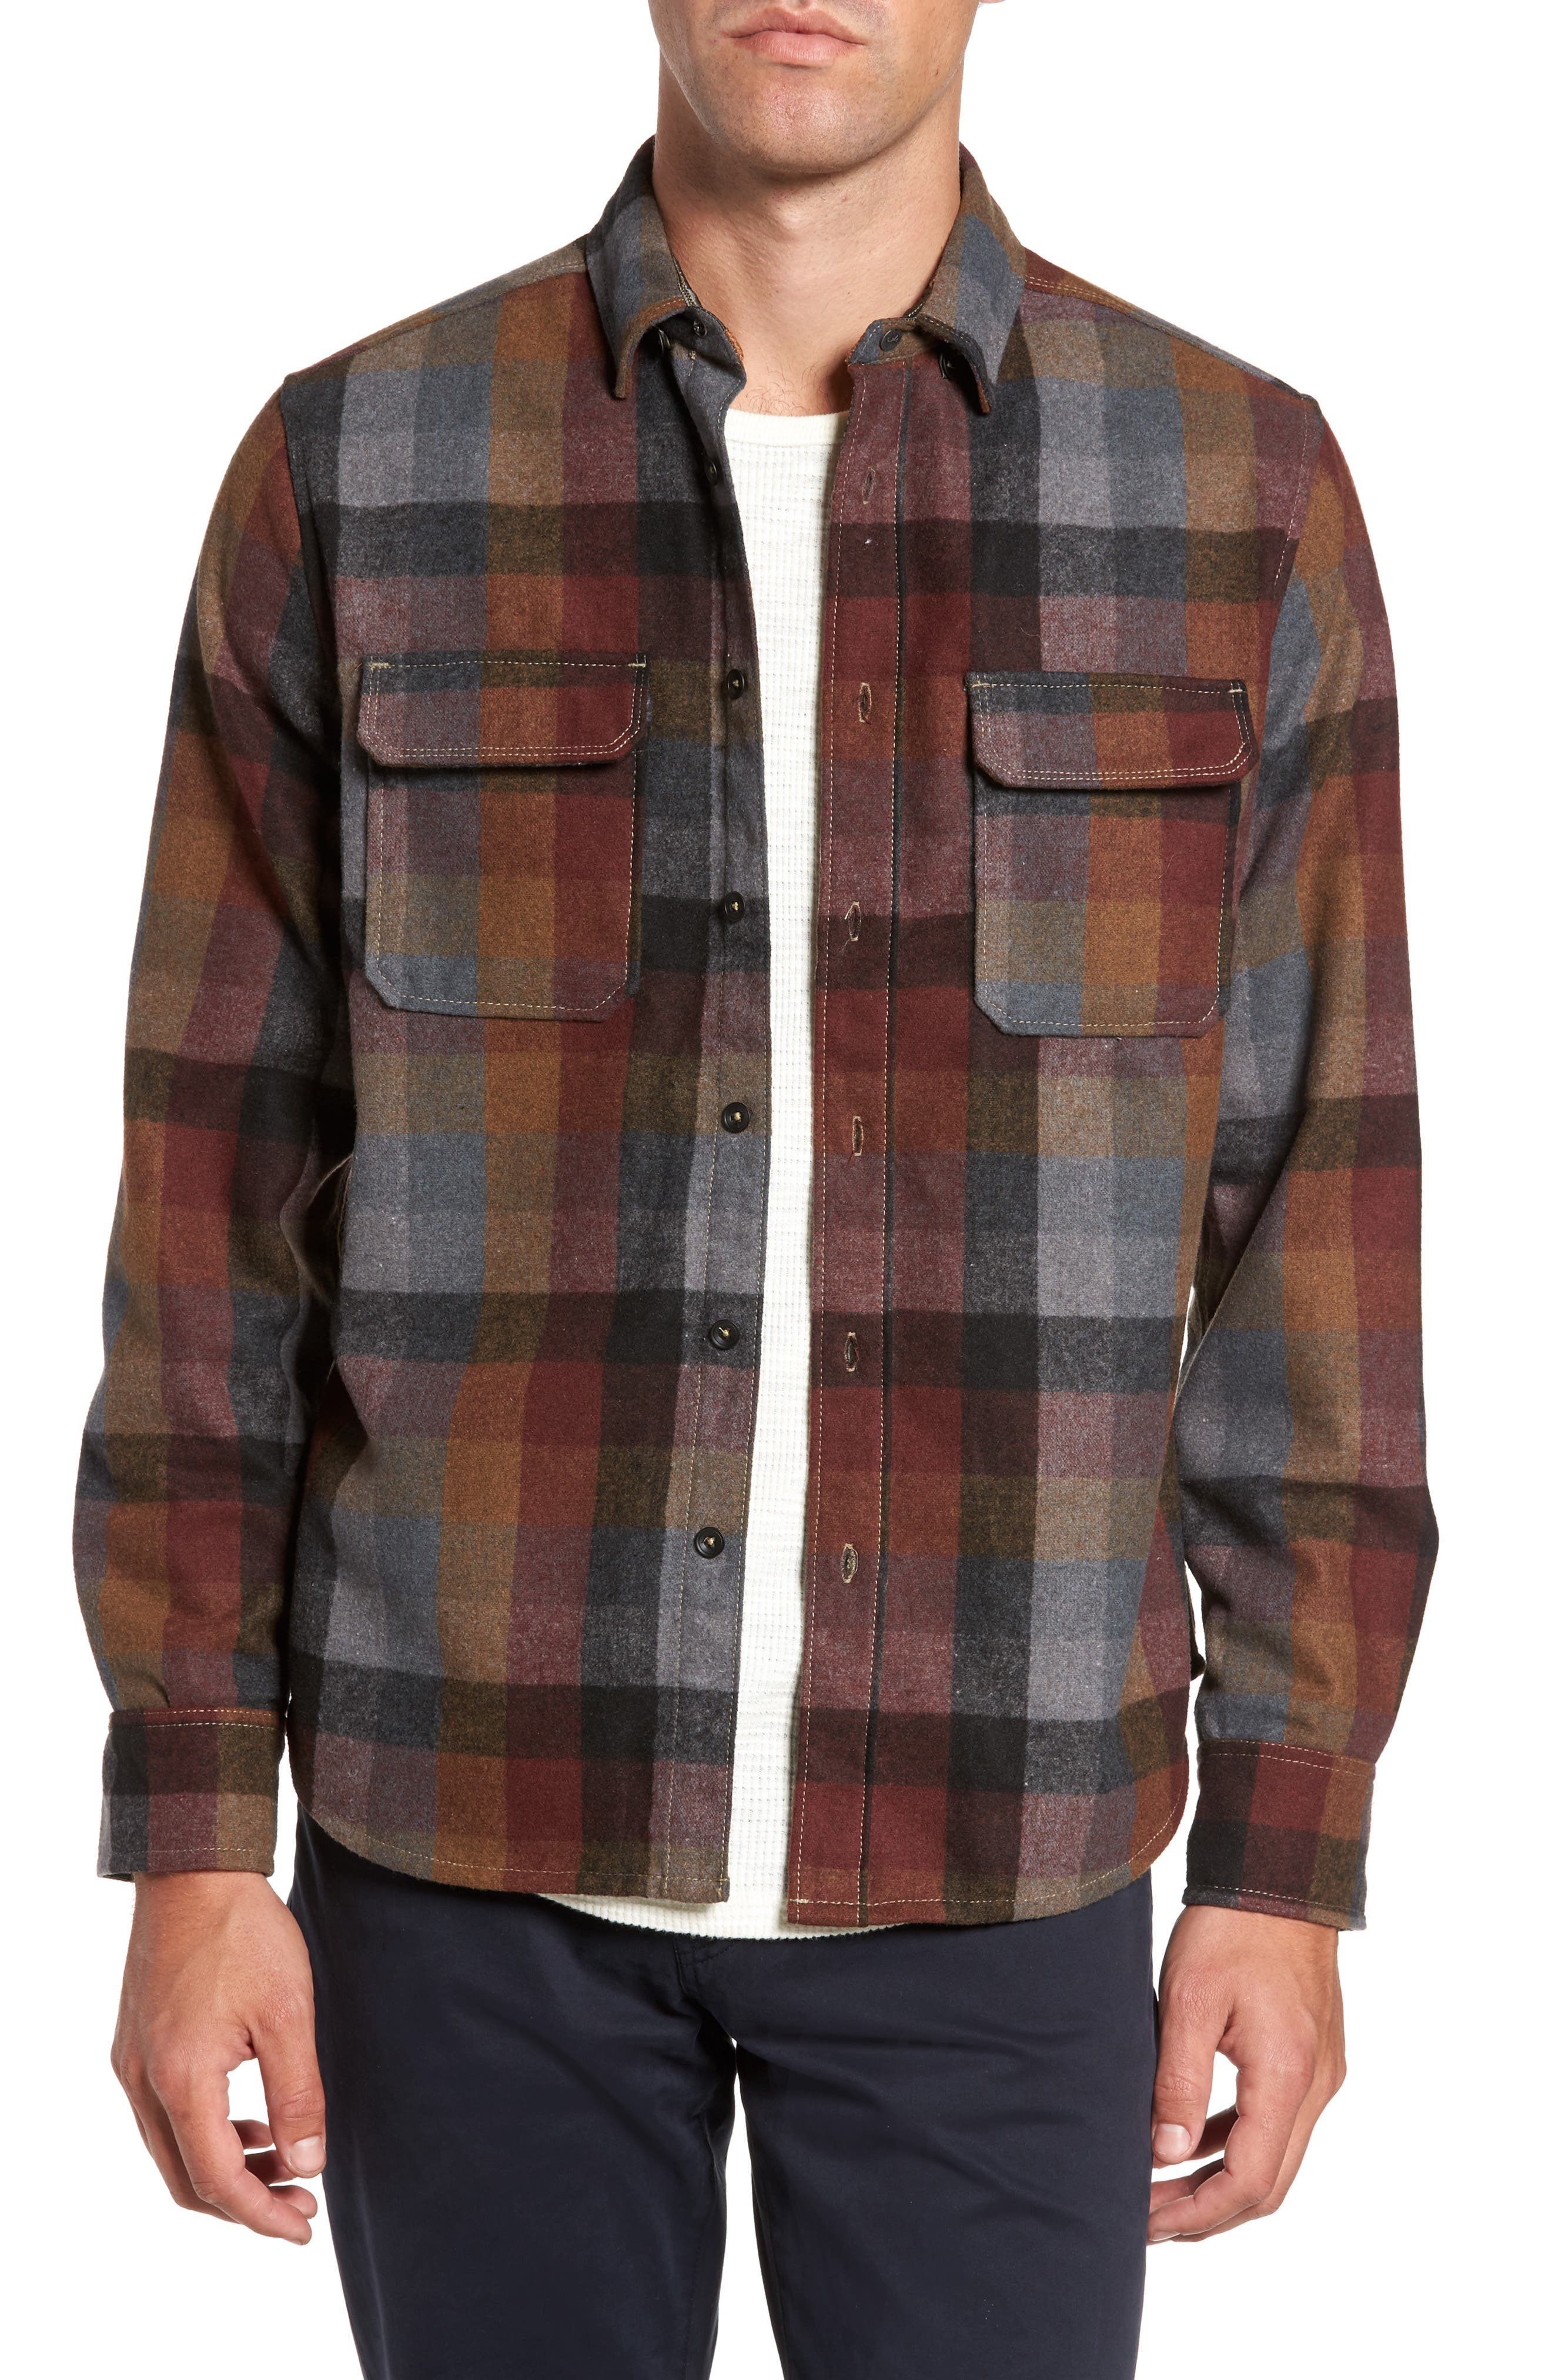 Jeremiah Heath Brushed Flannel Shirt, Burgundy